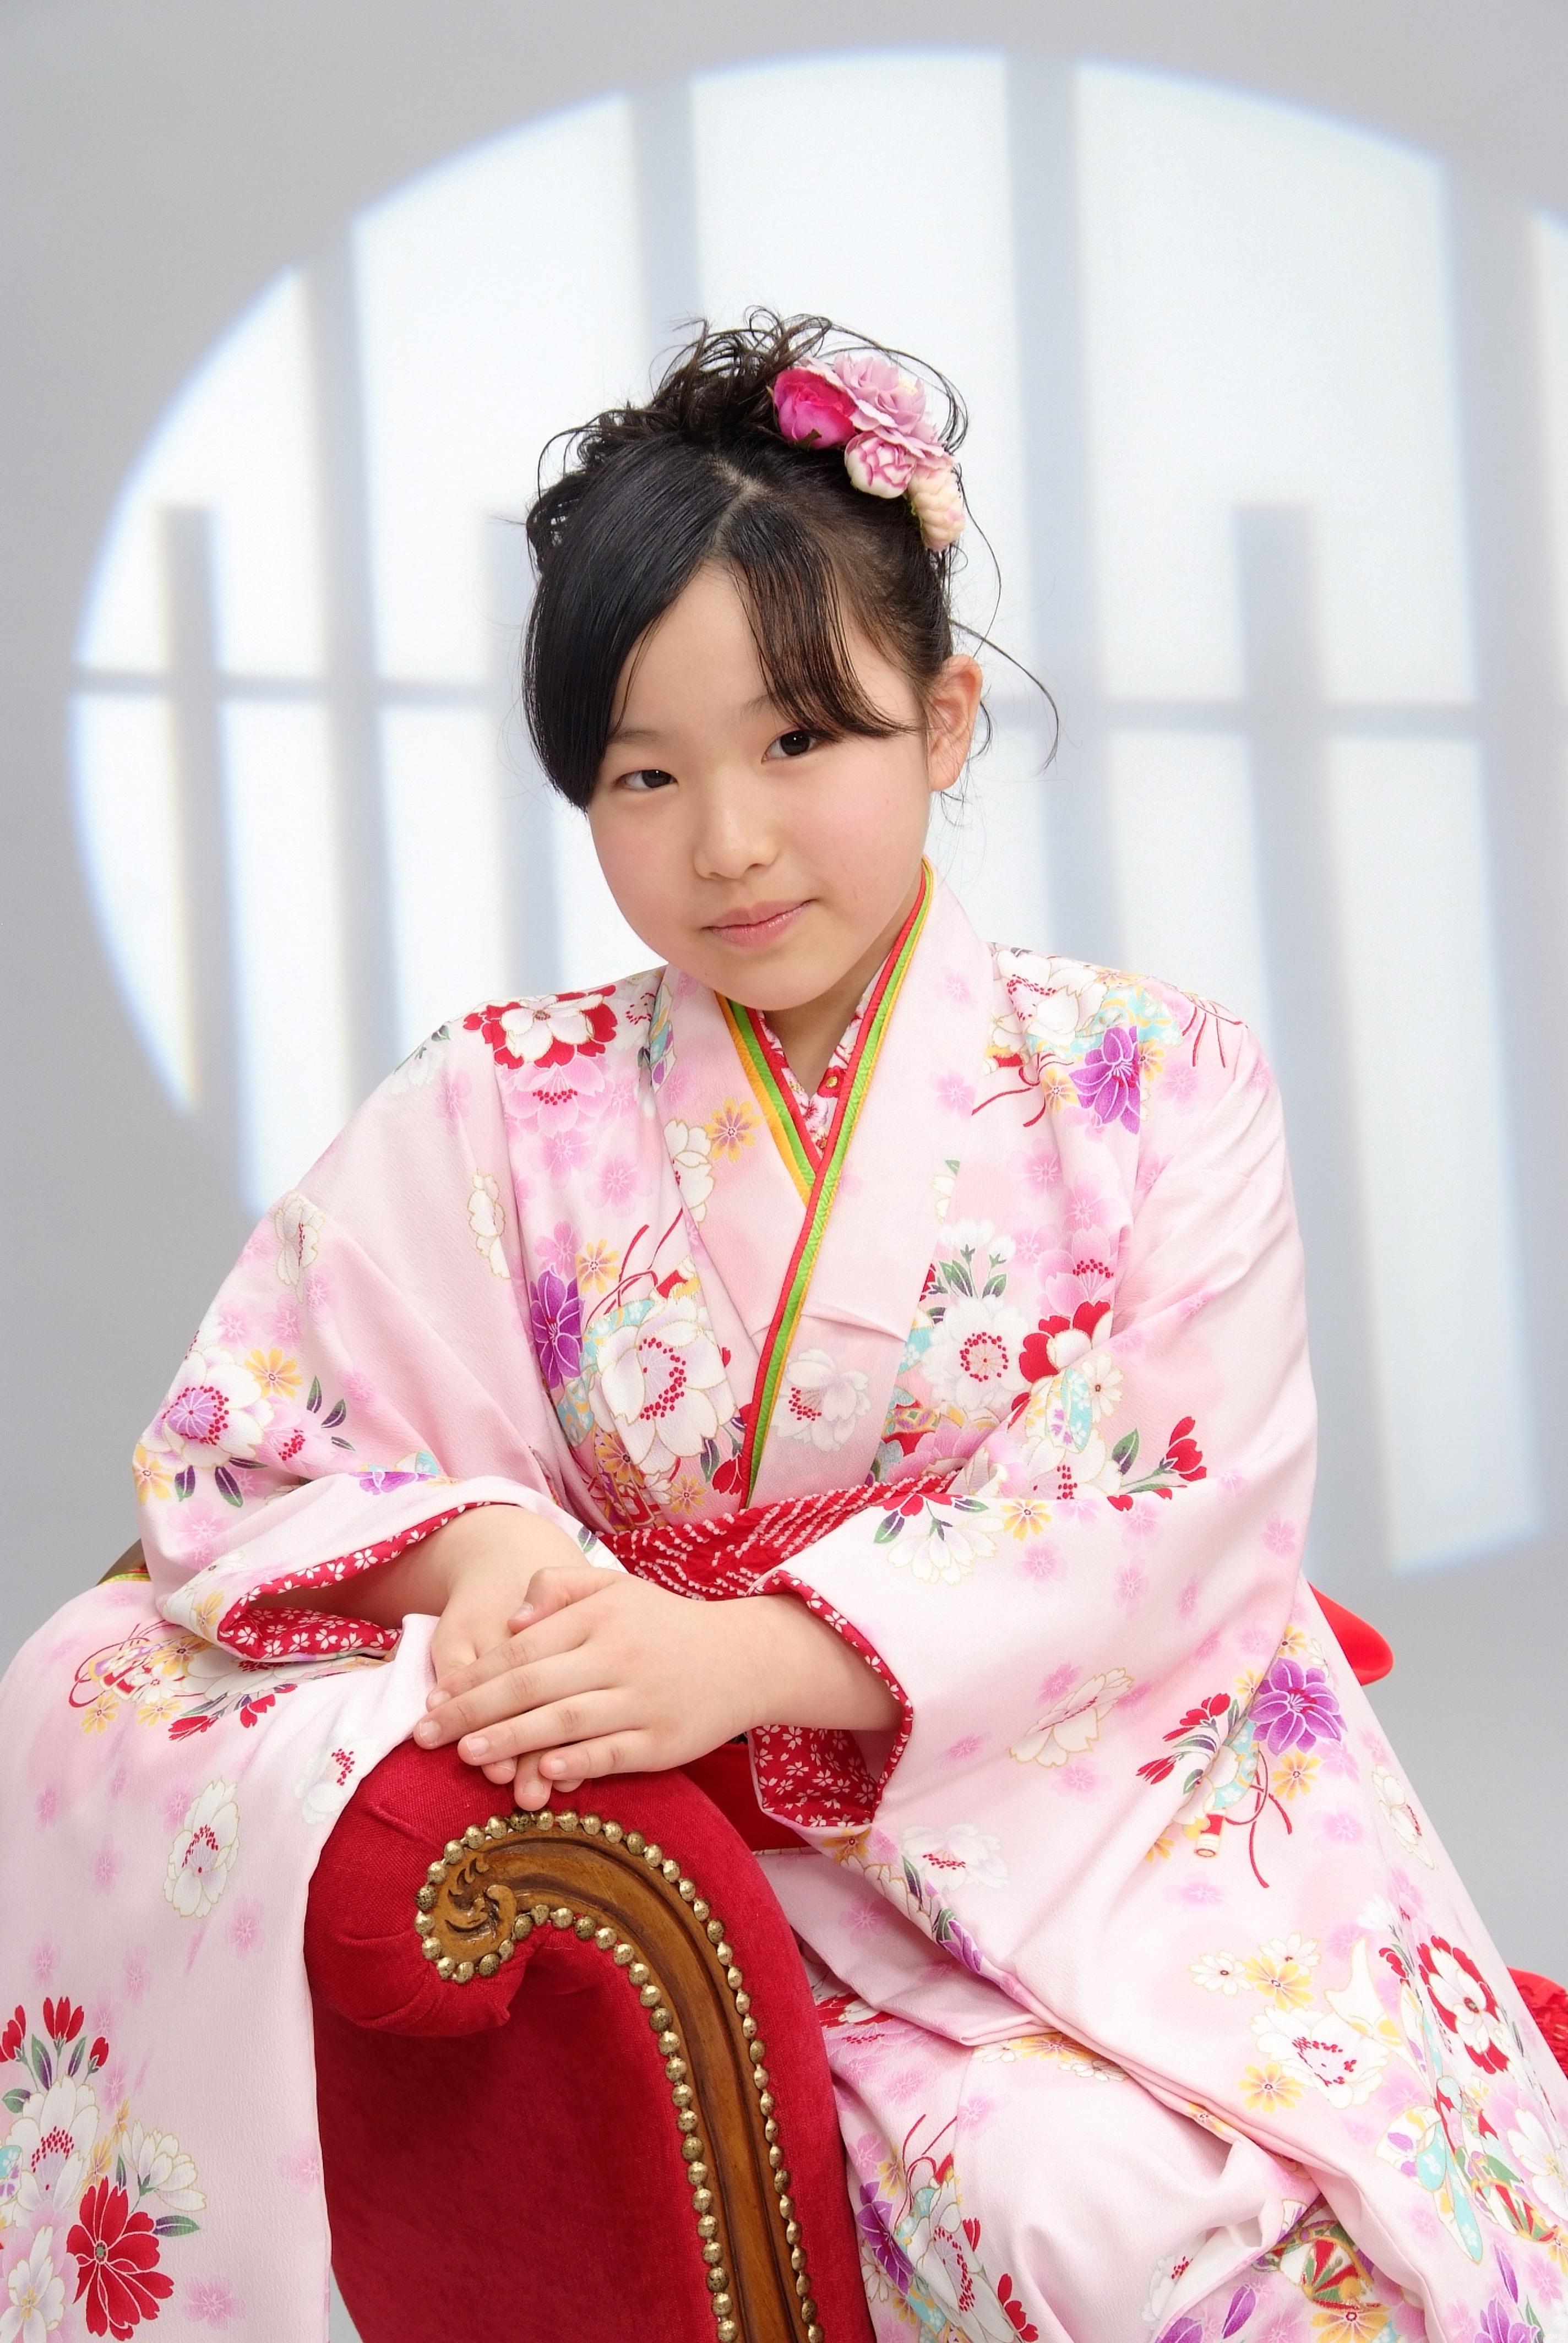 Kostenlose foto : Frau, Rosa, Braut, Kimono, Kleid, N, O, Kostüm, K ...